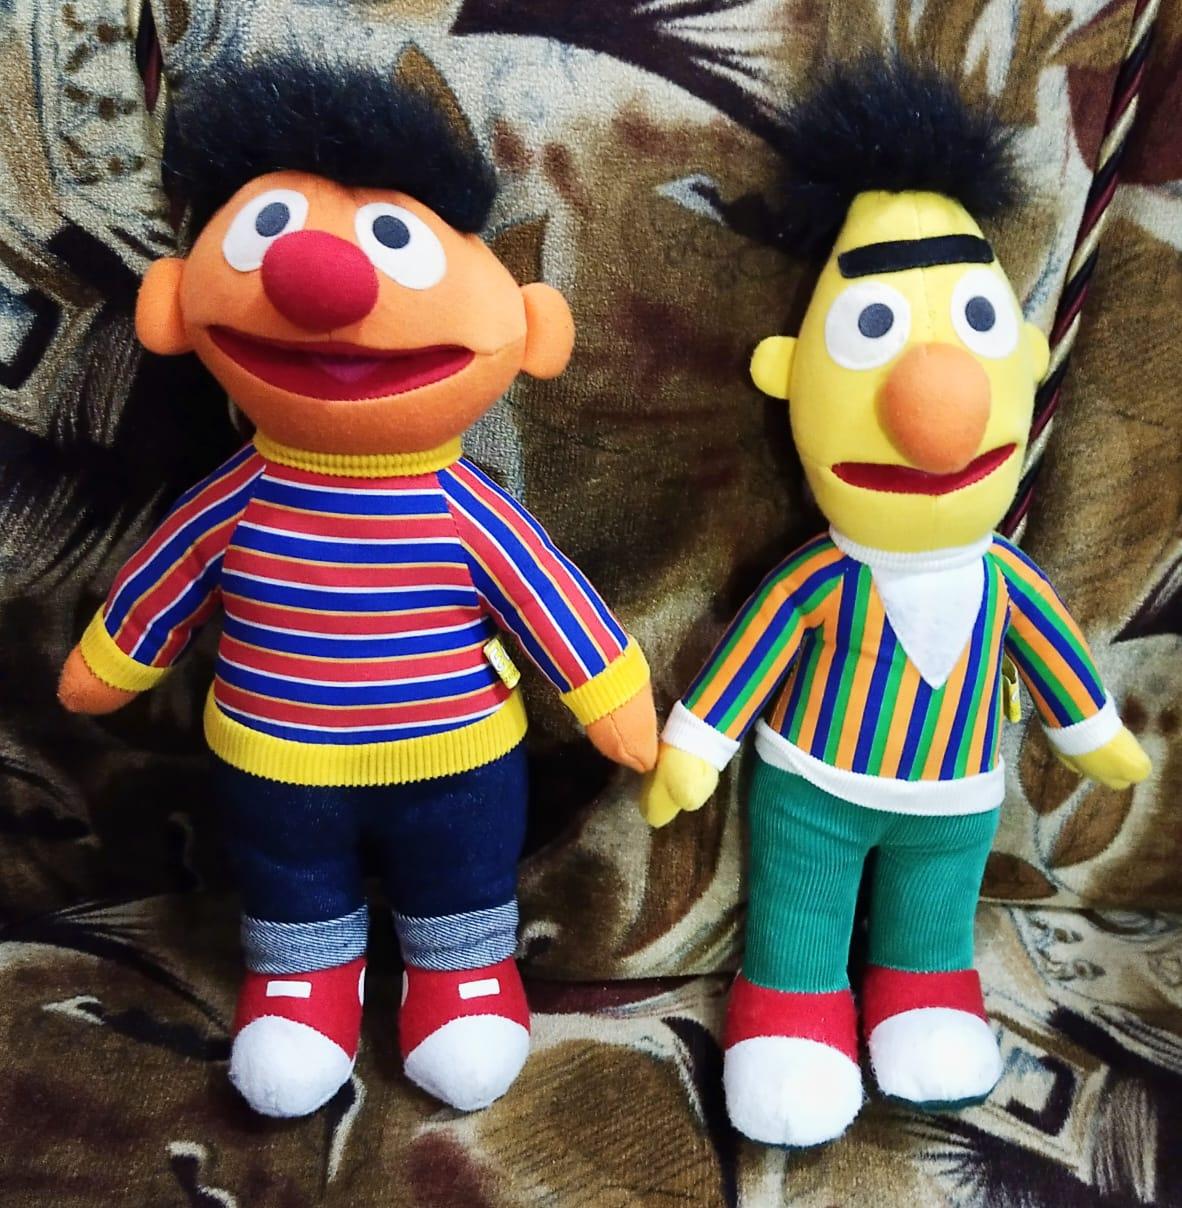 Sesame Street Ernie and Bert Plush Toys Pack 2